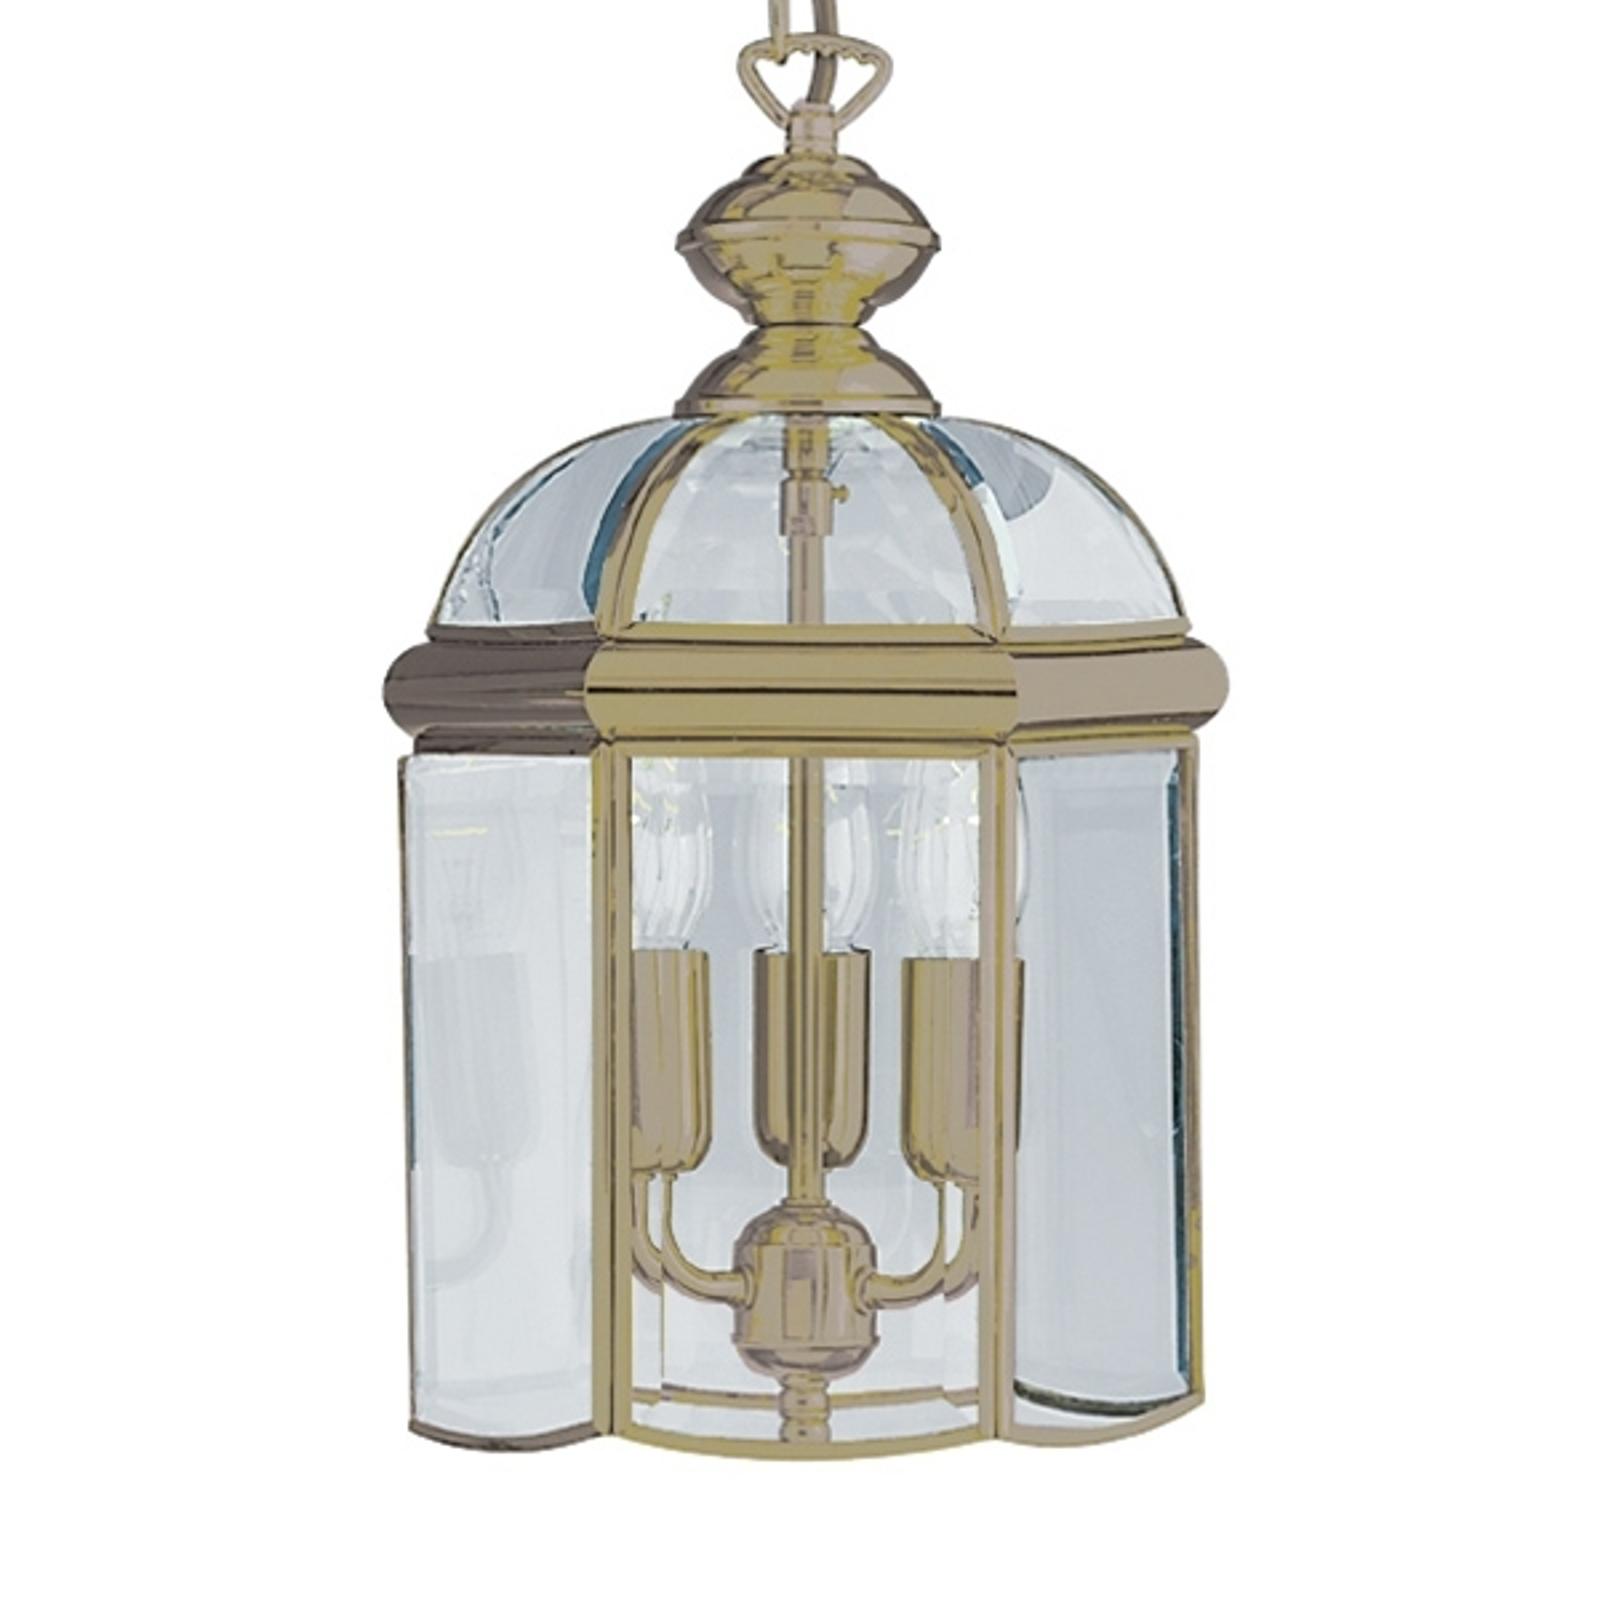 Lampada sosp forma lanterna ARLIND, ottone antico